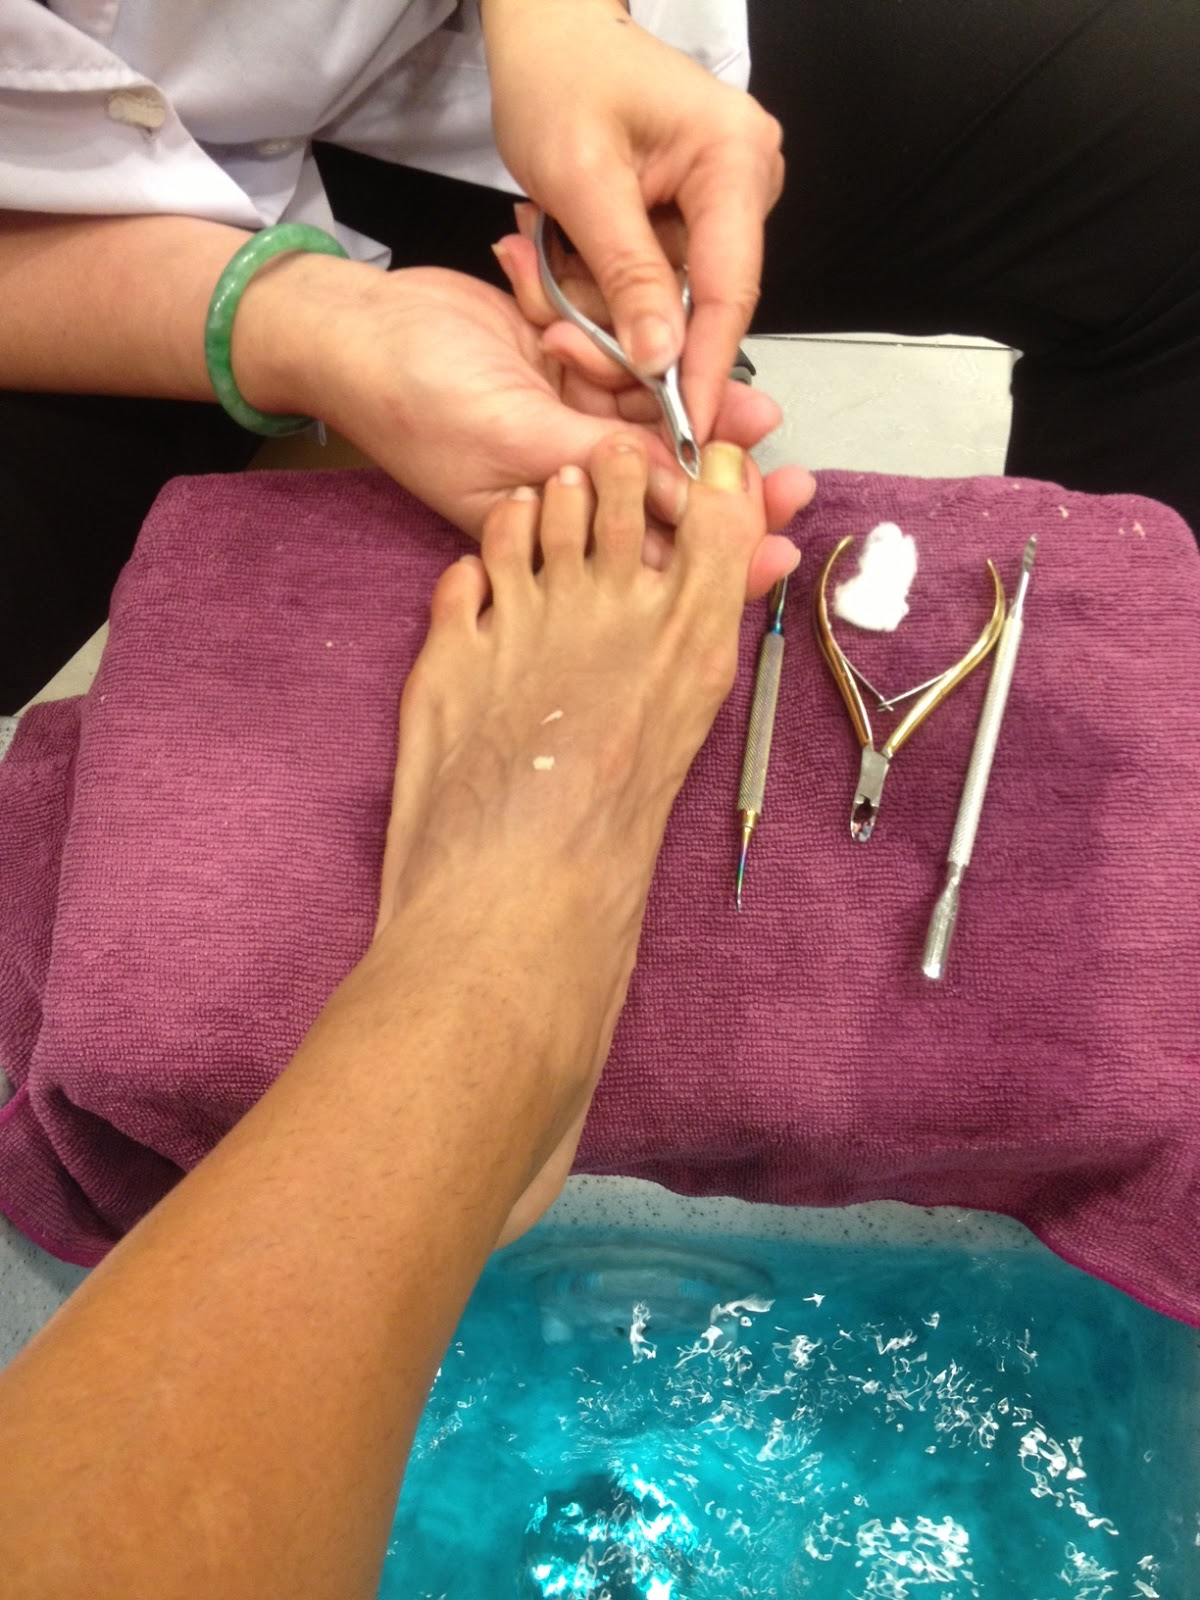 ... toe next to the big one is broken. The big toe has an ingrown toenail